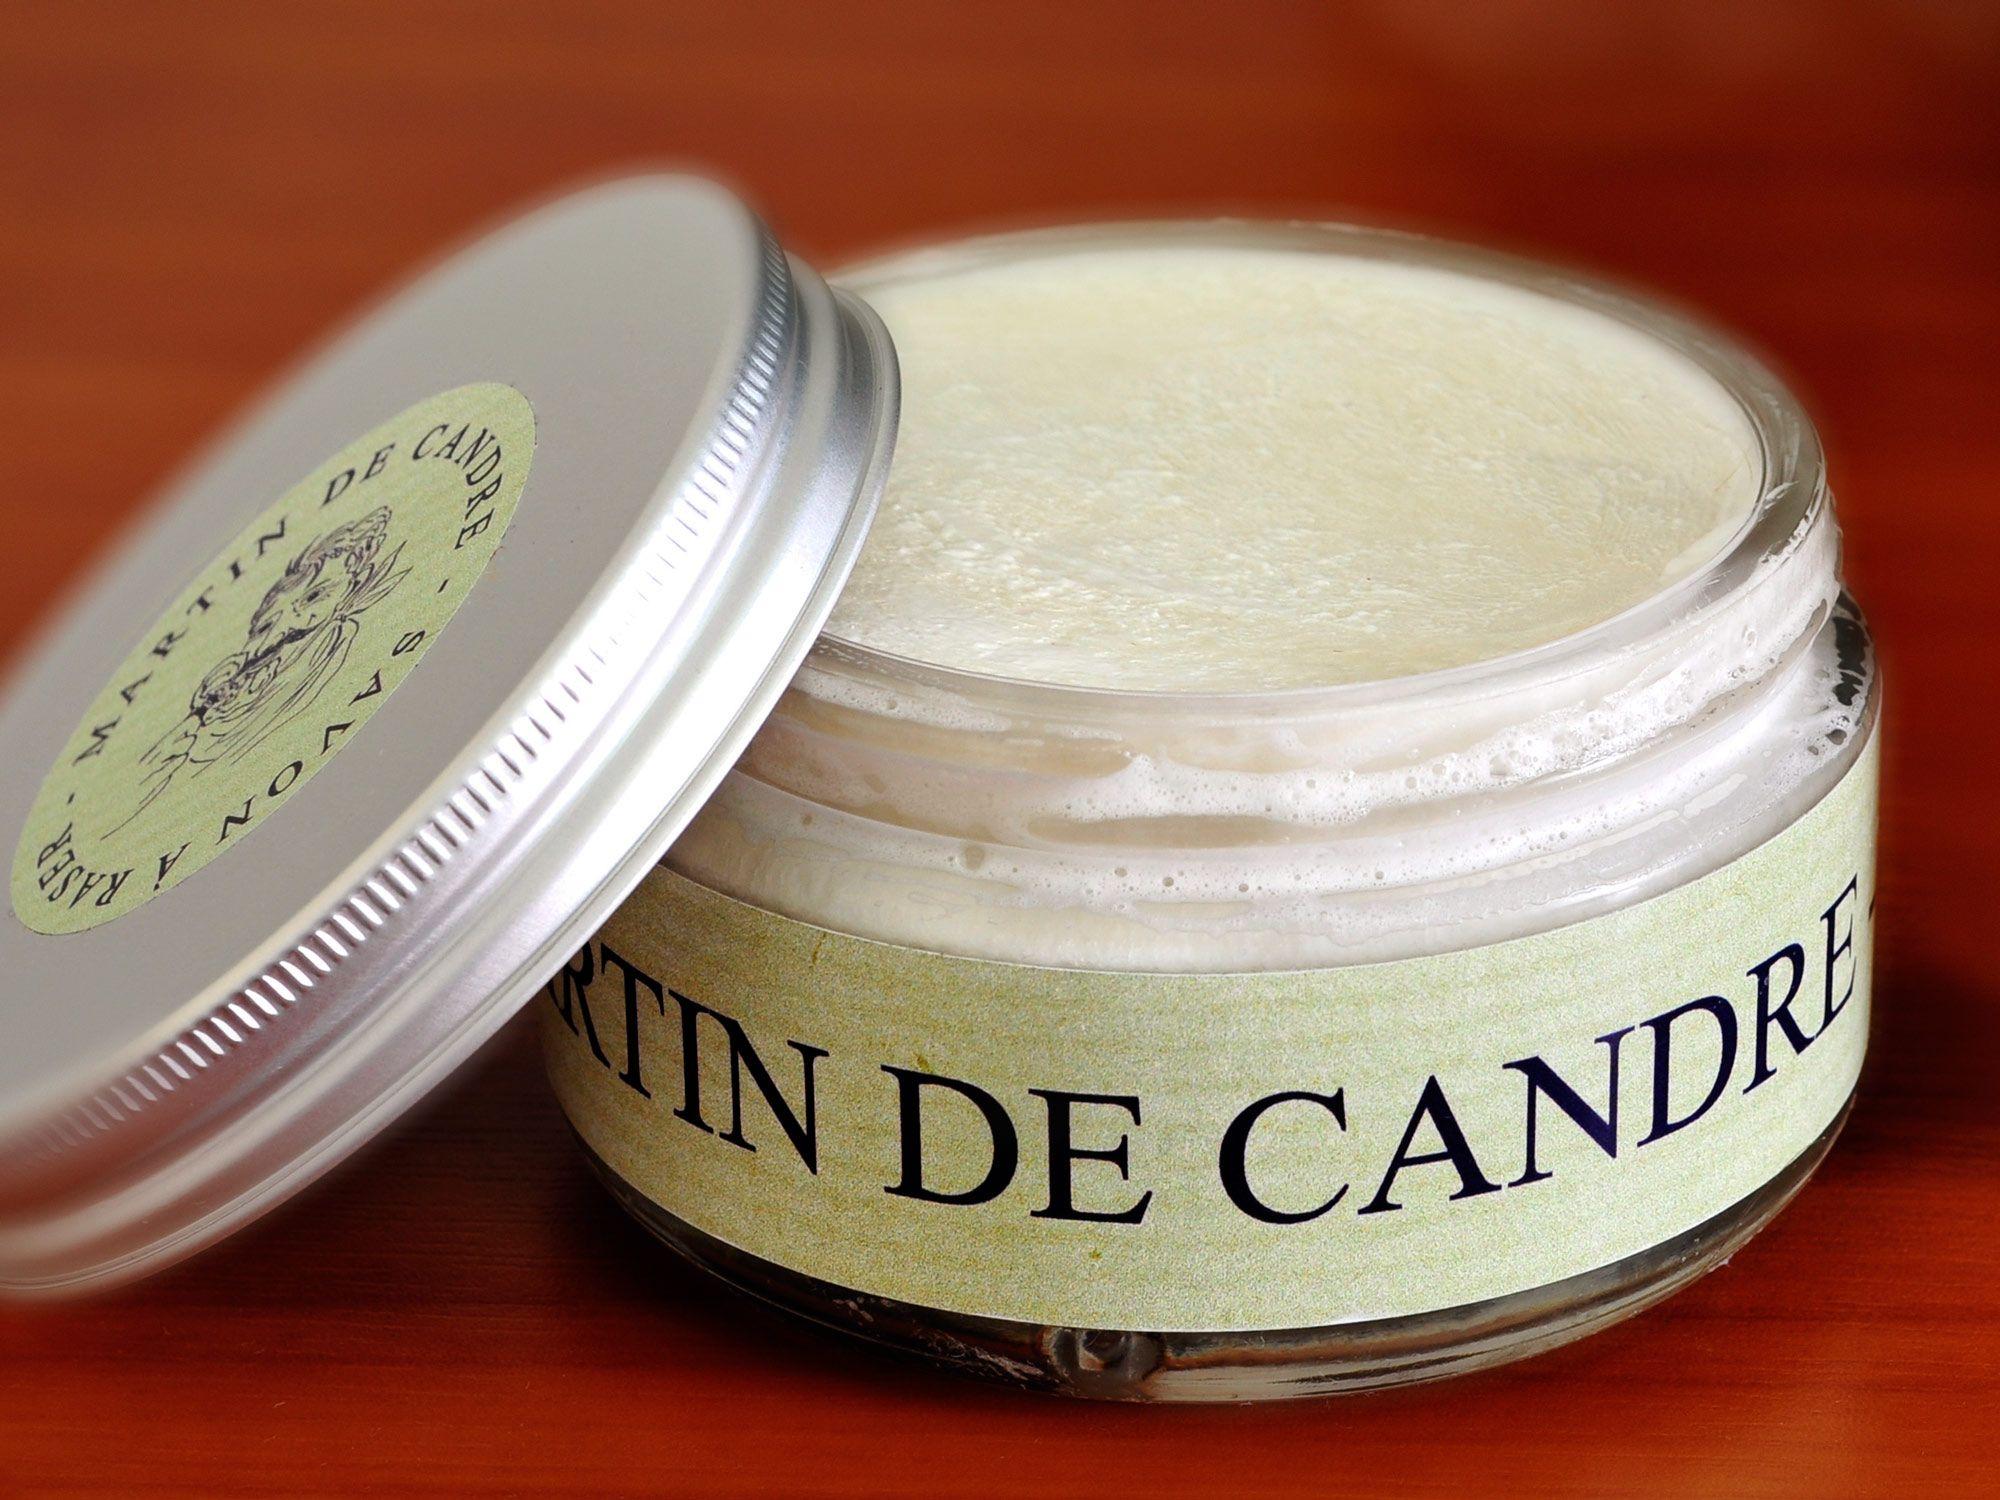 Oryginalne opakowanie z mydłem do golenia Martin de Candrea